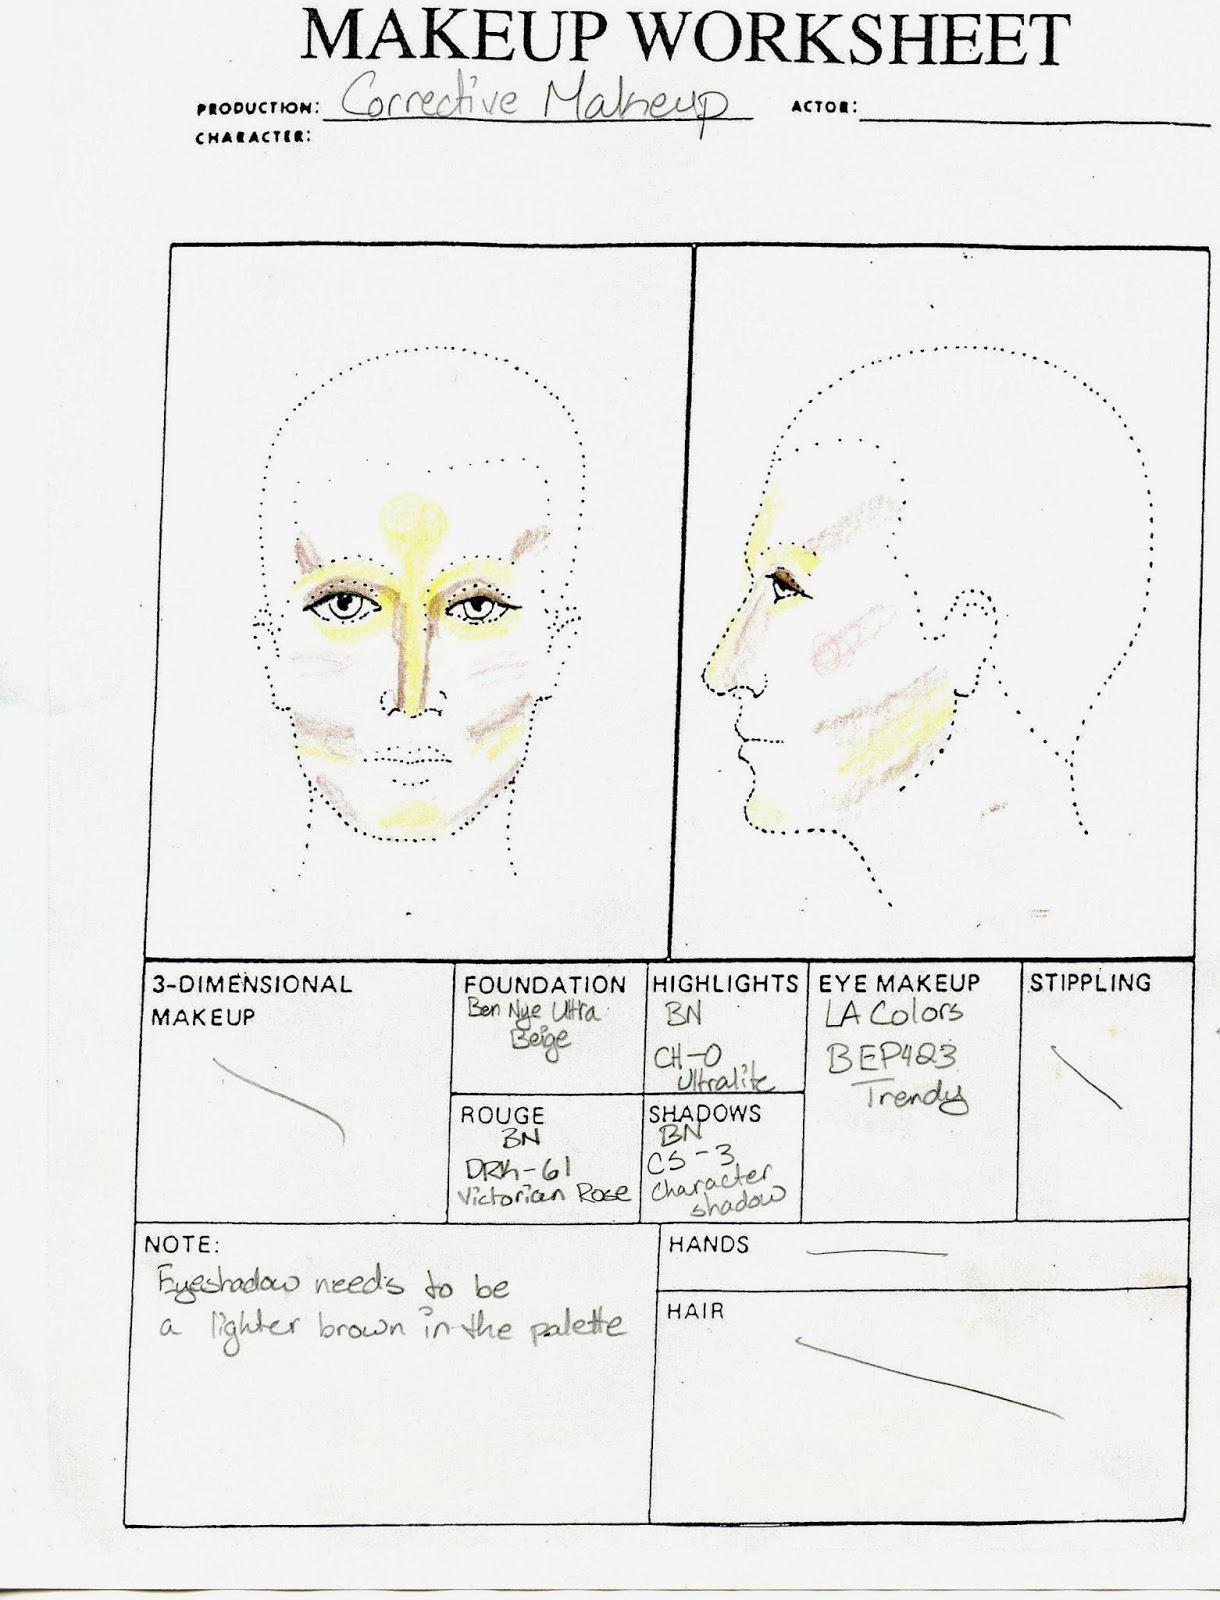 Stage Makeup Morgue Corrective Makeup